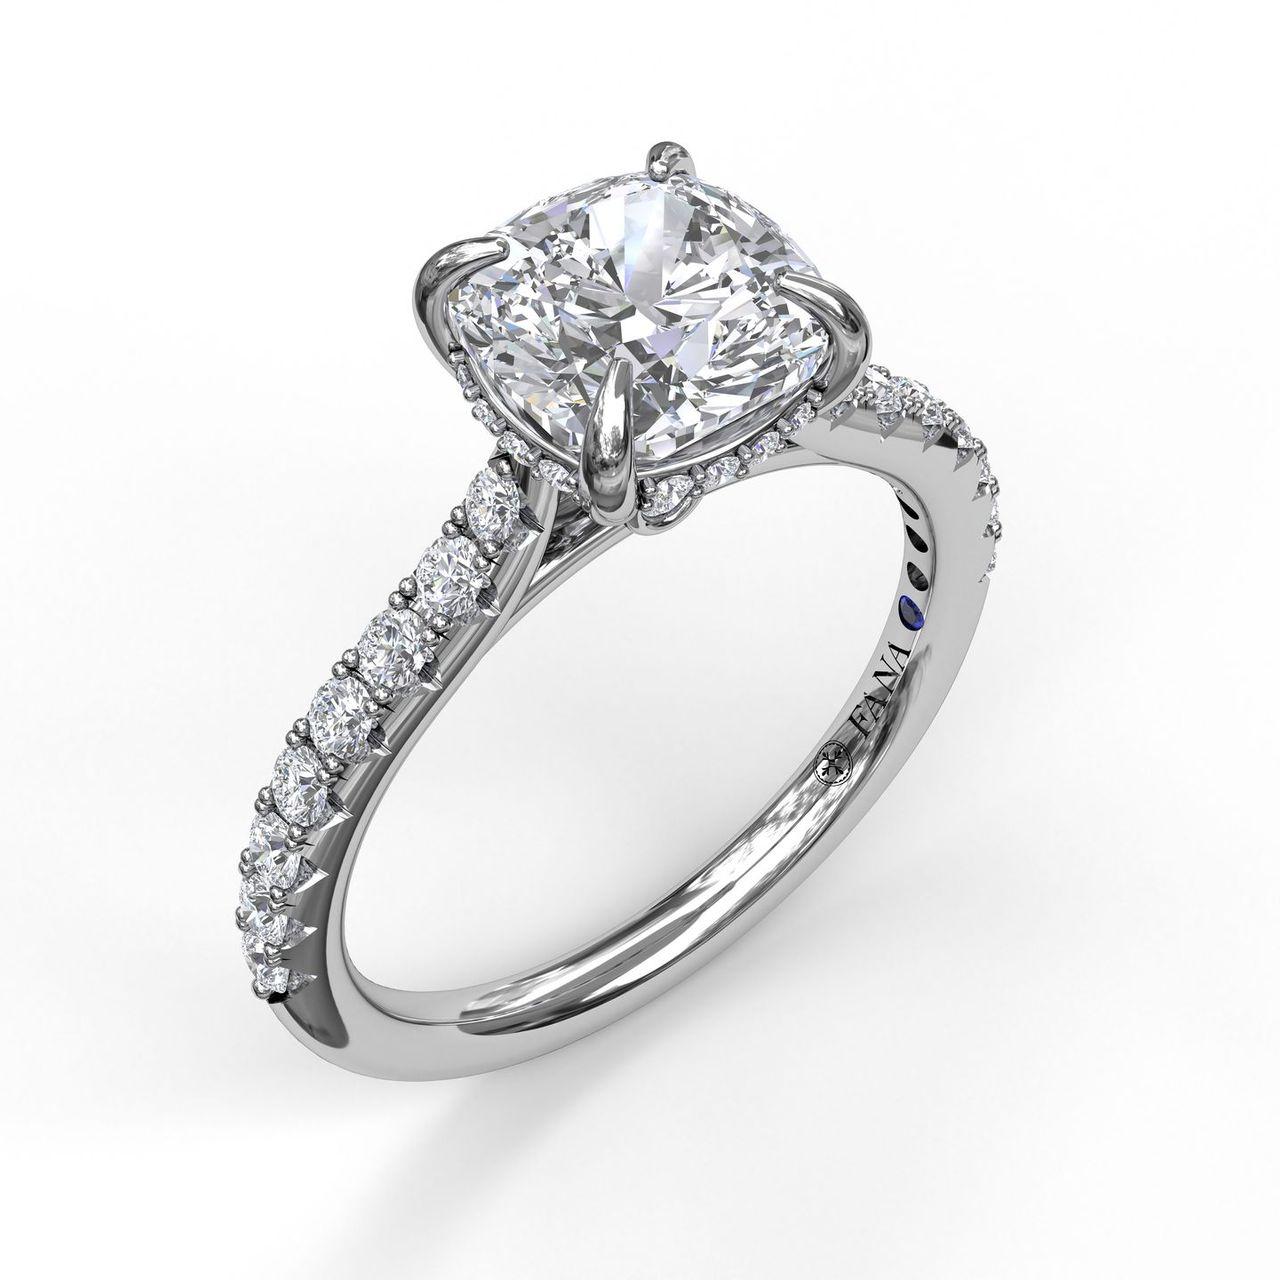 Classic Cushion Cut Engagement Ring with a Subtle Diamond Splash